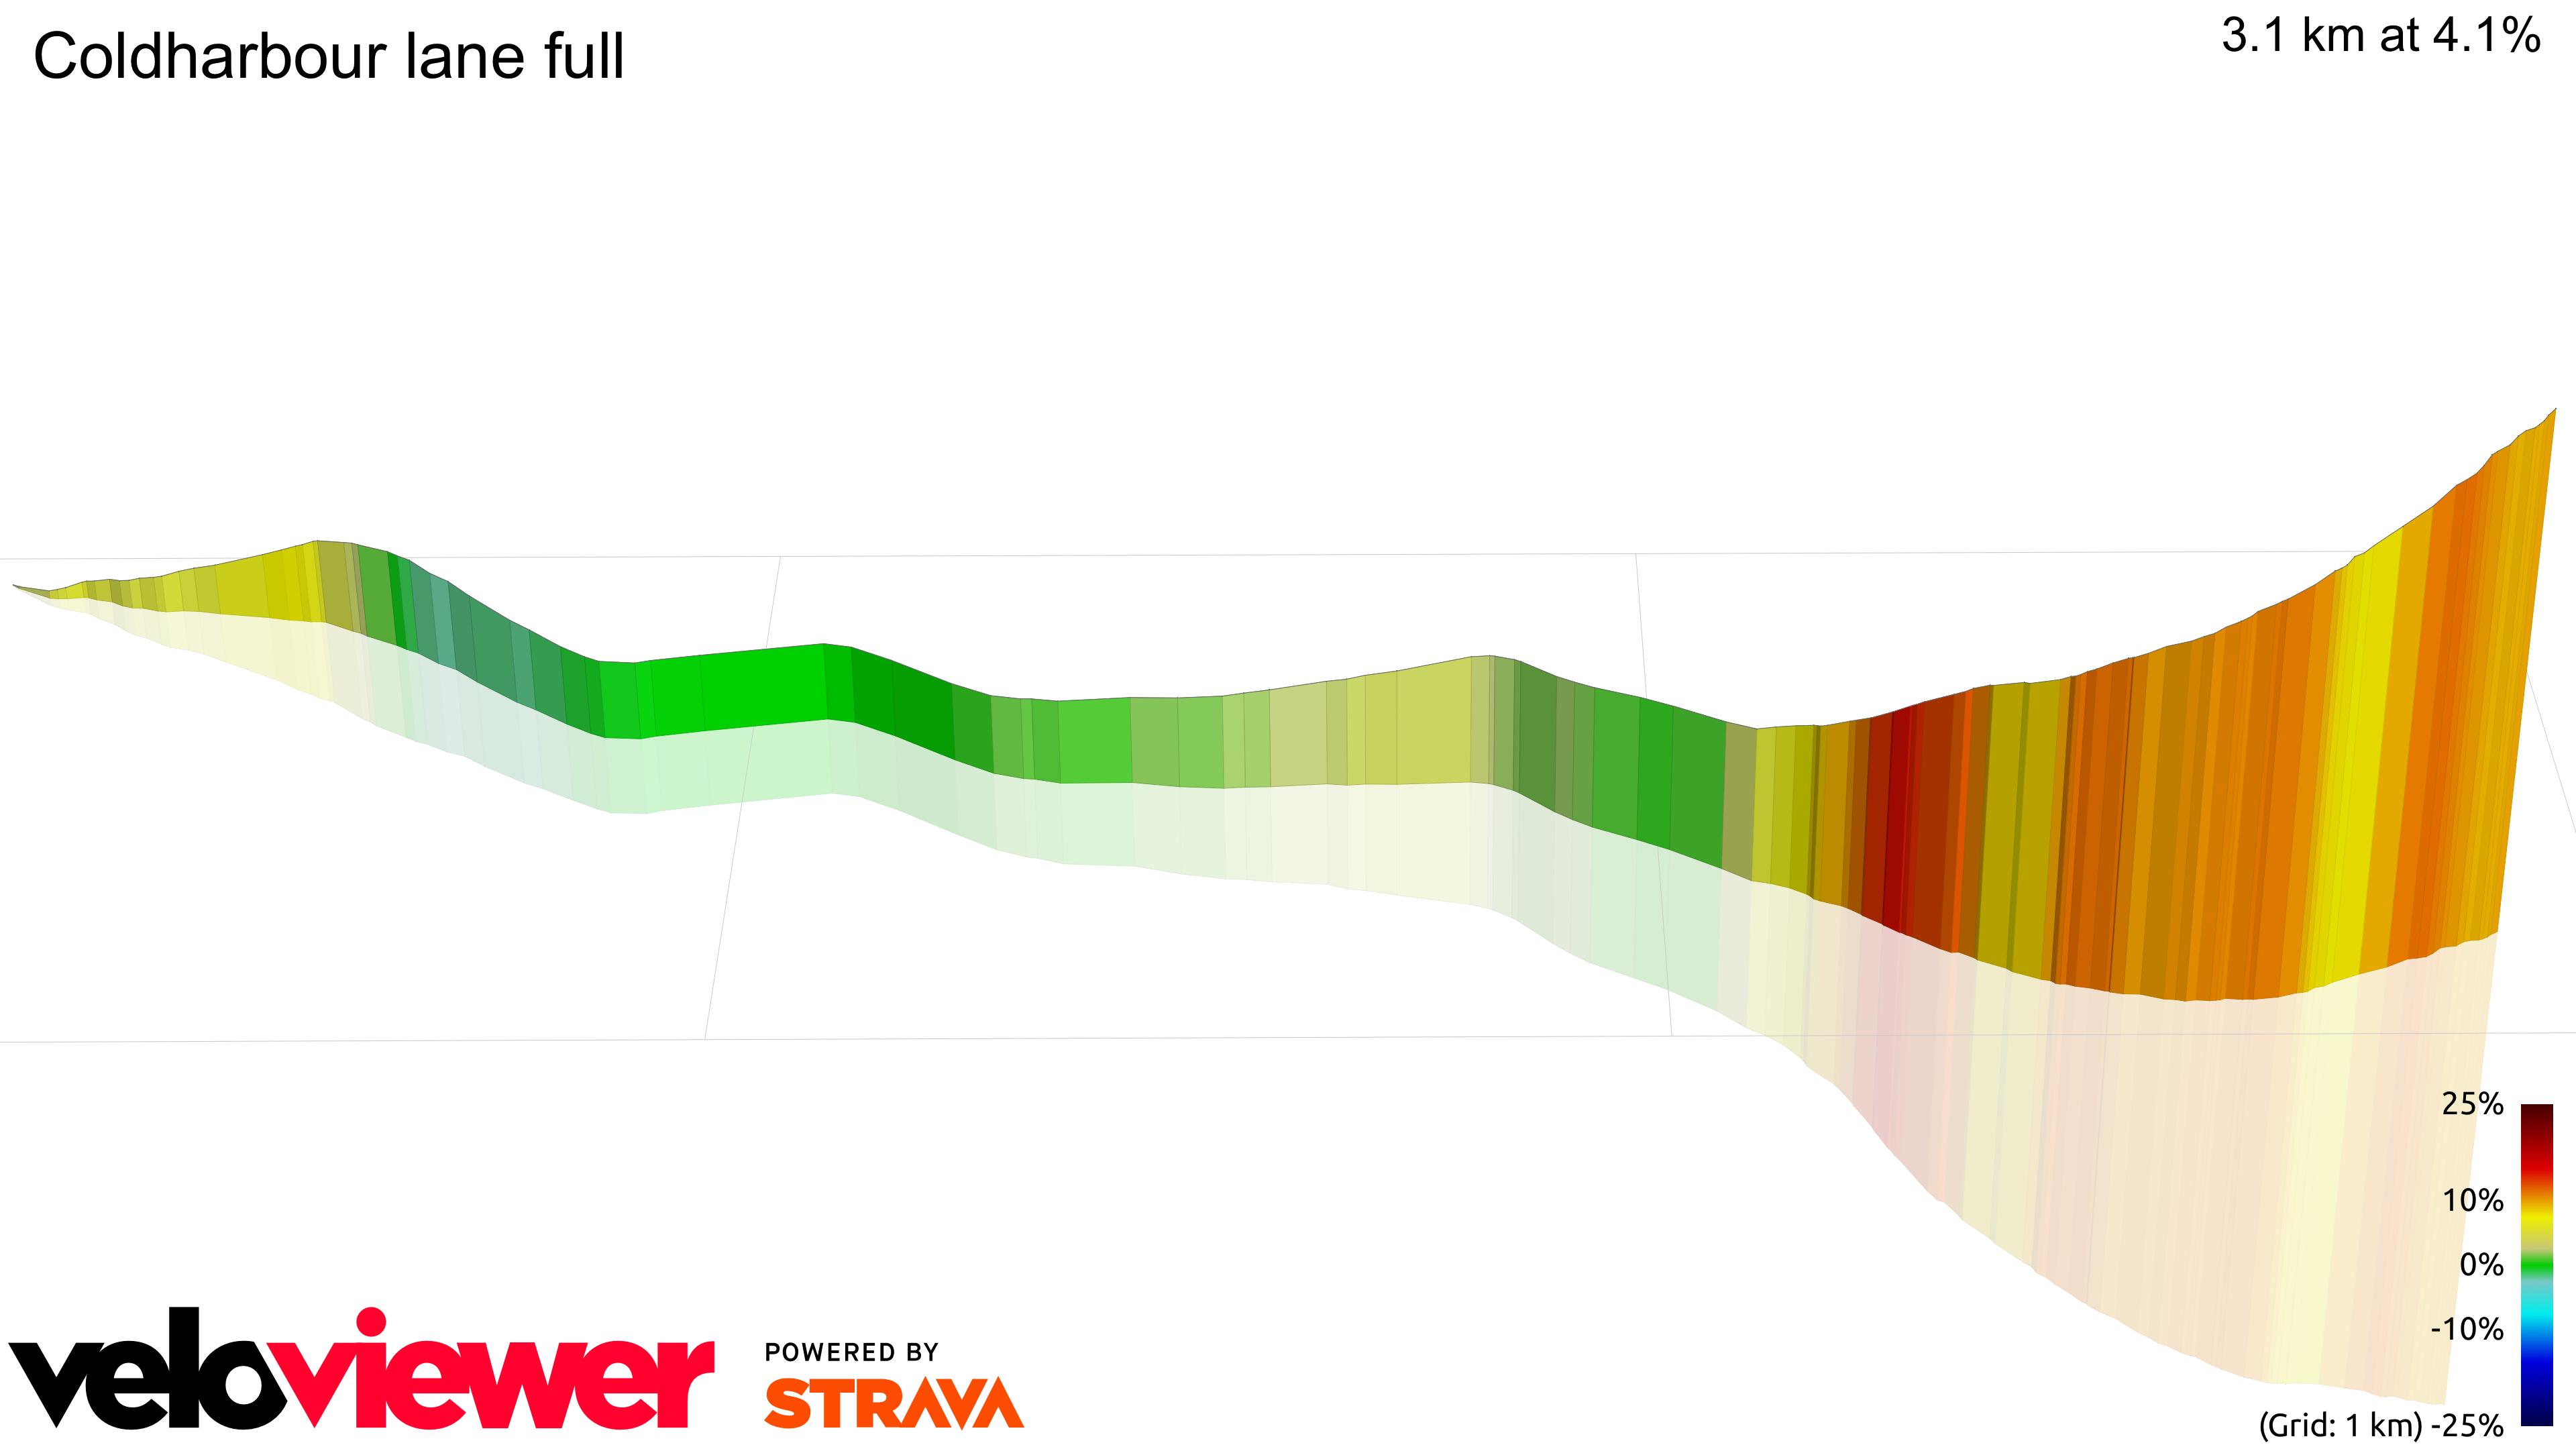 3D Elevation profile image for Coldharbour lane full